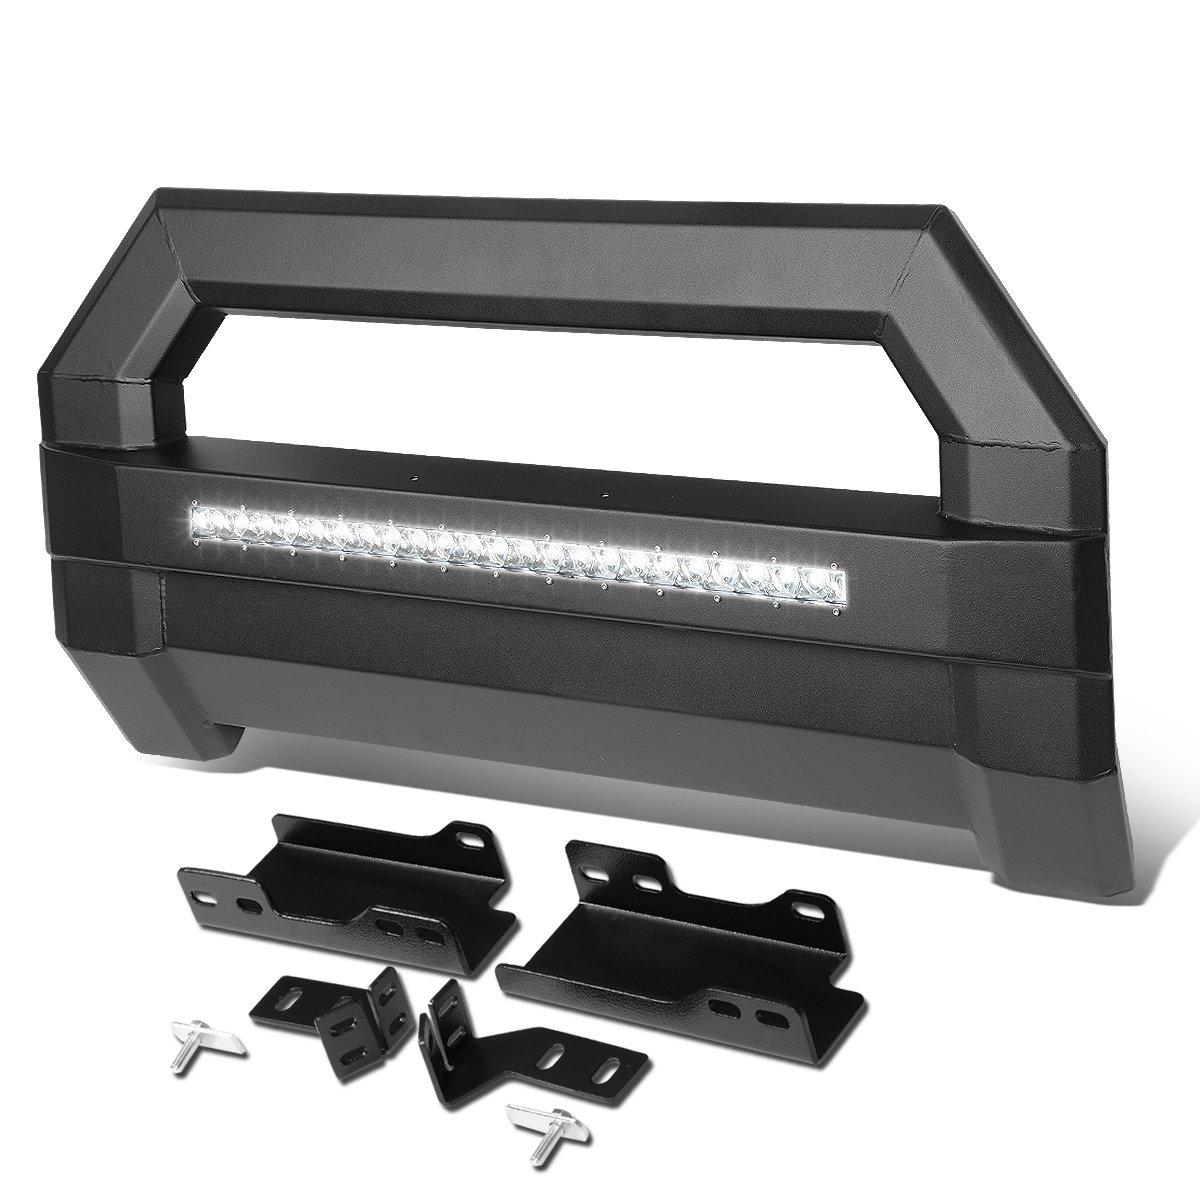 For Chevy Tahoe/GMC Yukon Square Tube Lightweight Bull Bar w/LED Light+License Plate Relocation Kit (Black) Auto Dynasty